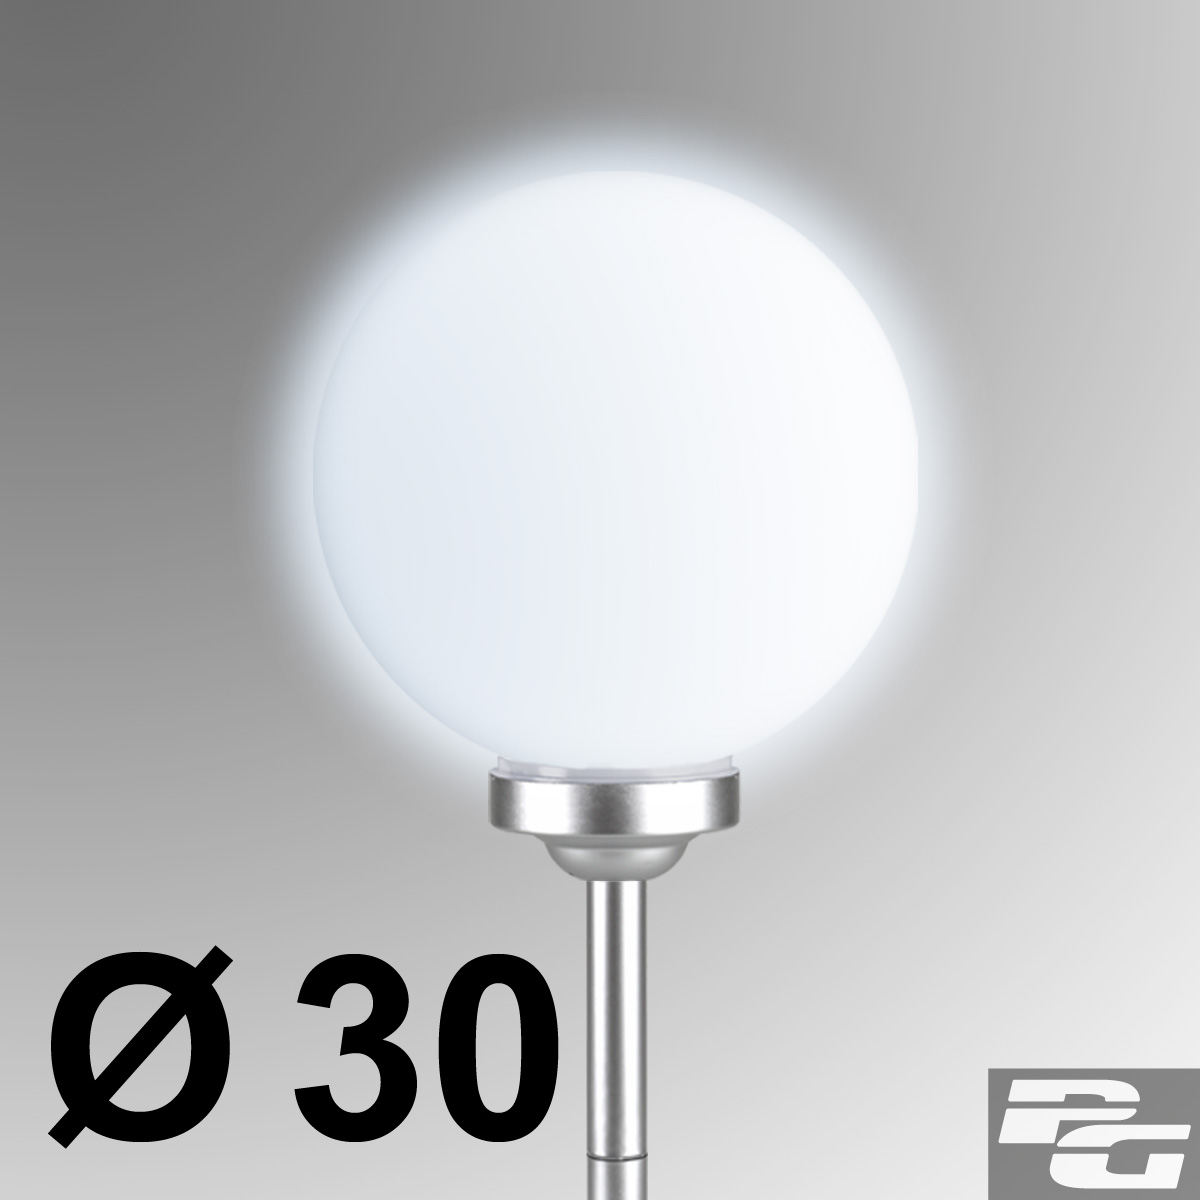 Kynast-Kugelleuchte-Kugellampe-LED-Aussenleuchte-Solar-Licht-Kugel-Gartenlampe